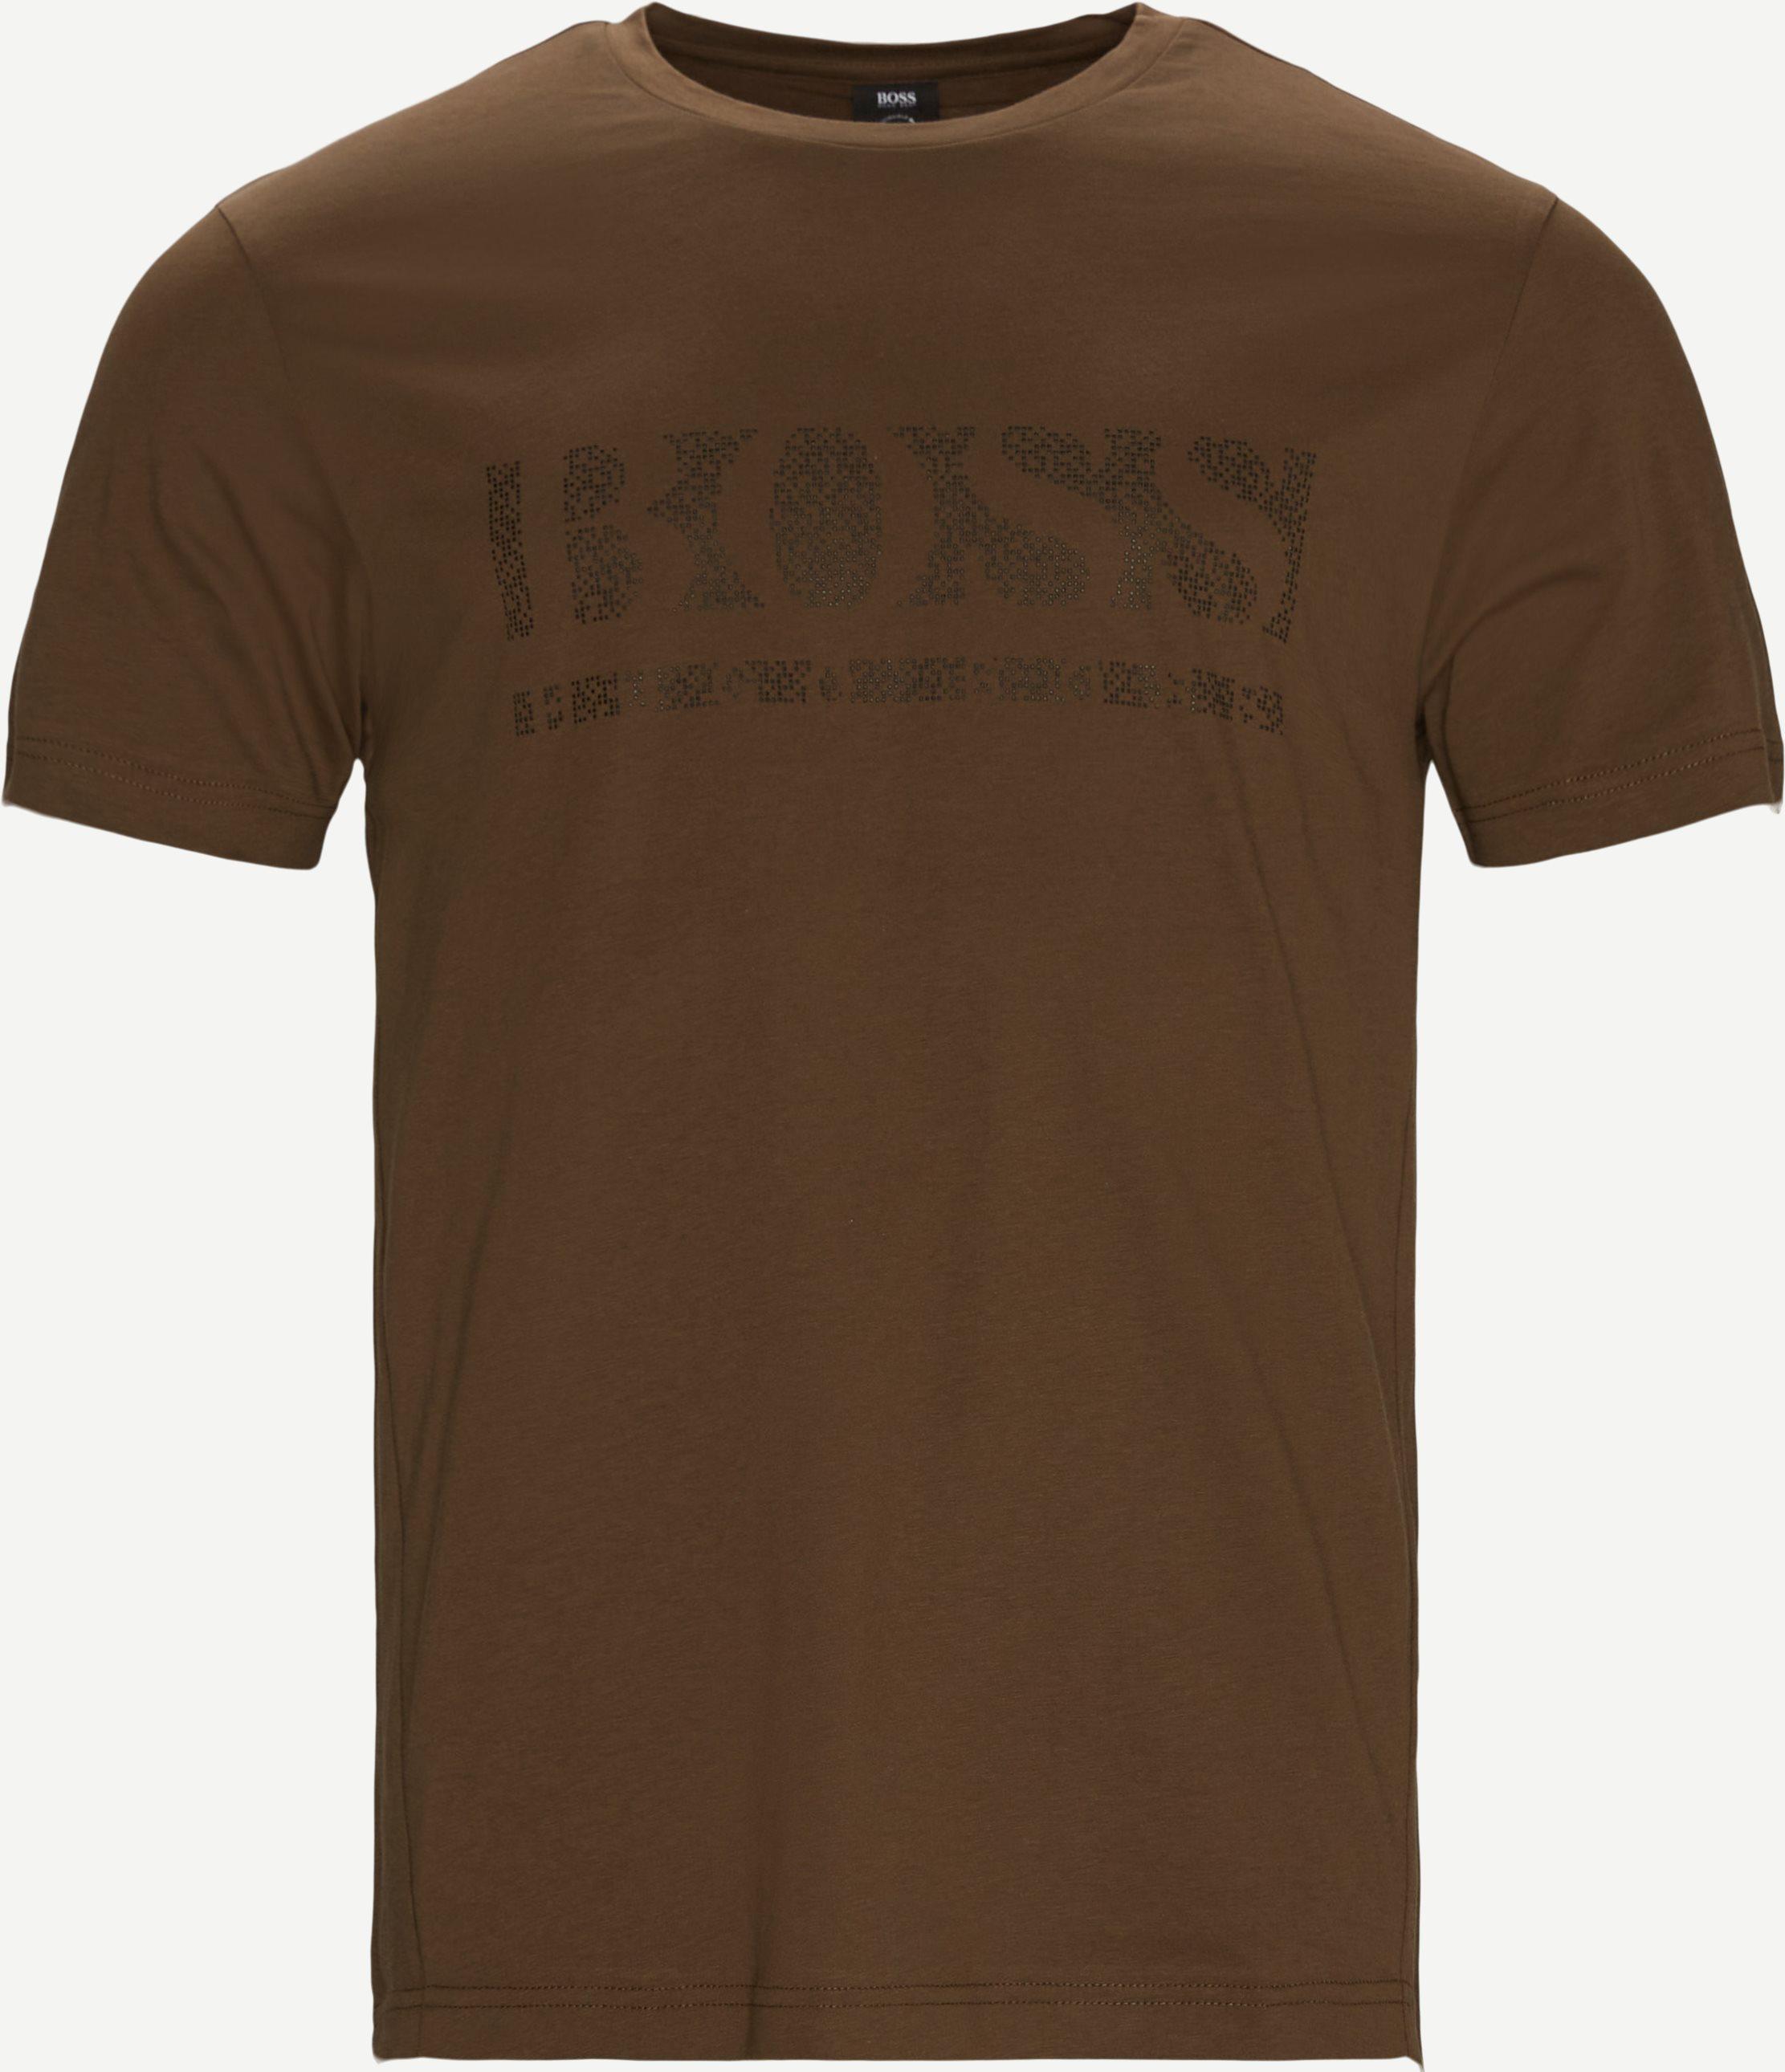 Pixel1 Tee - T-shirts - Regular fit - Army